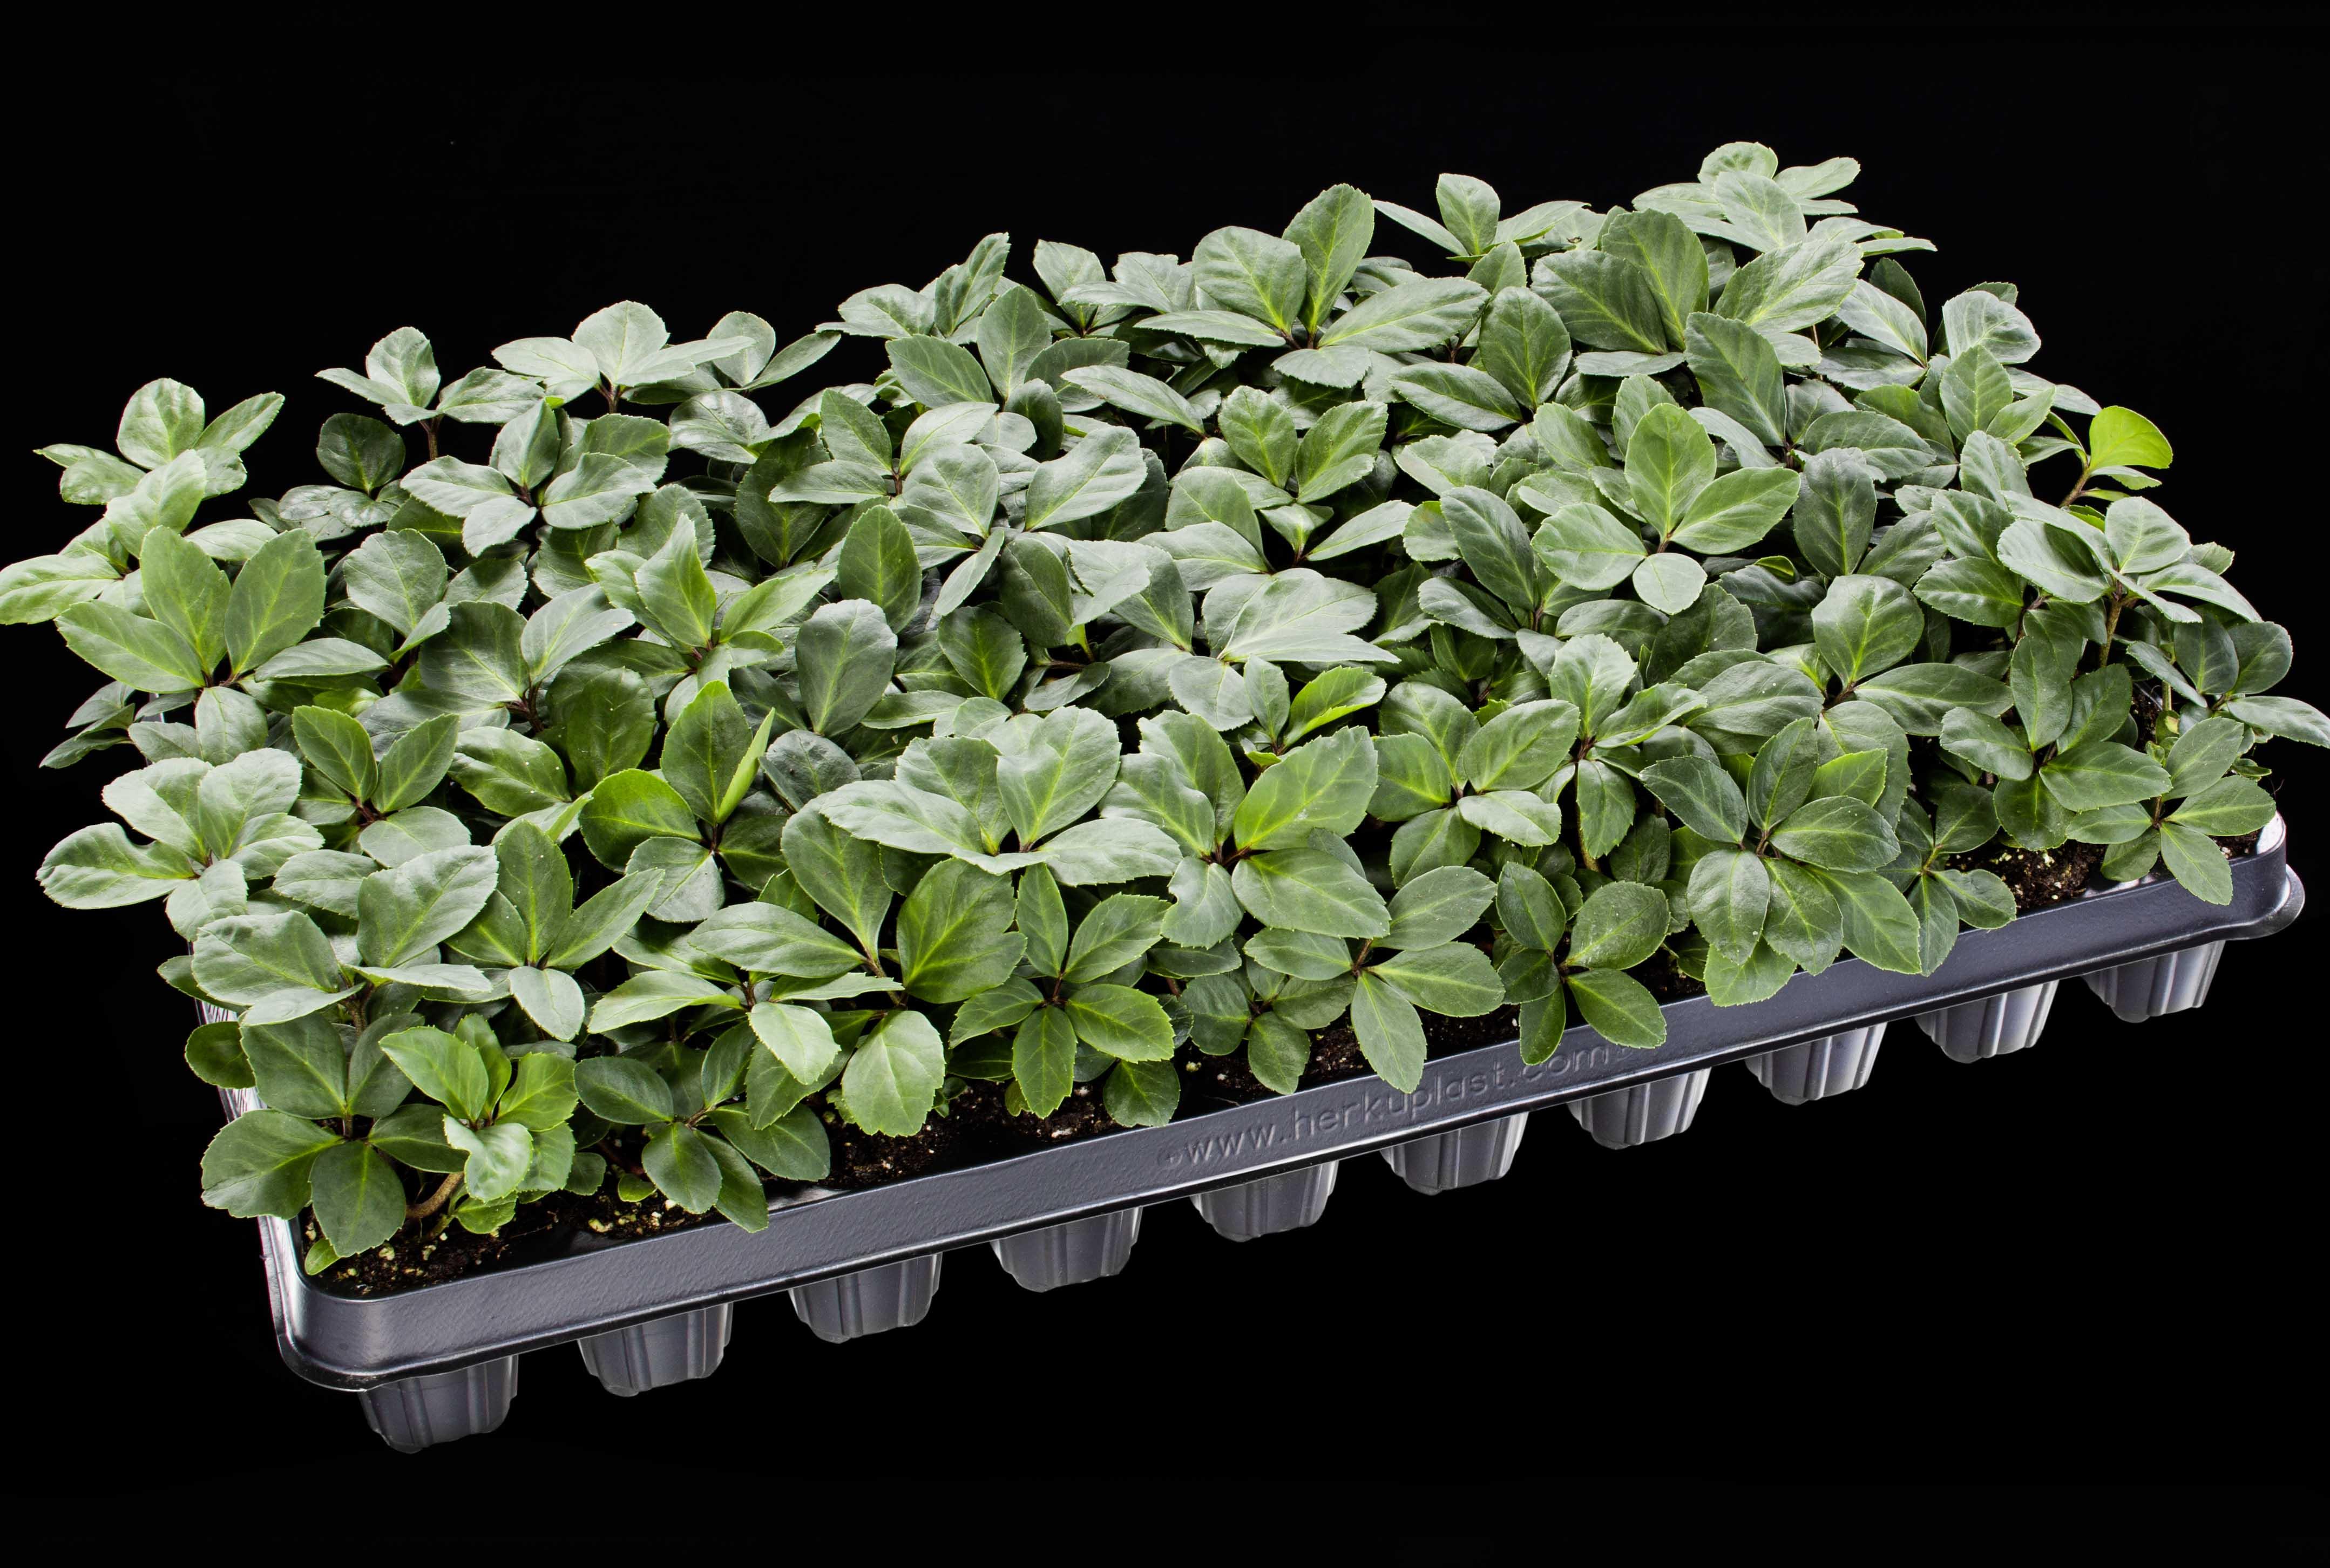 Gartenbaubetriebe  Young plants | Heuger Gartenbaubetriebe